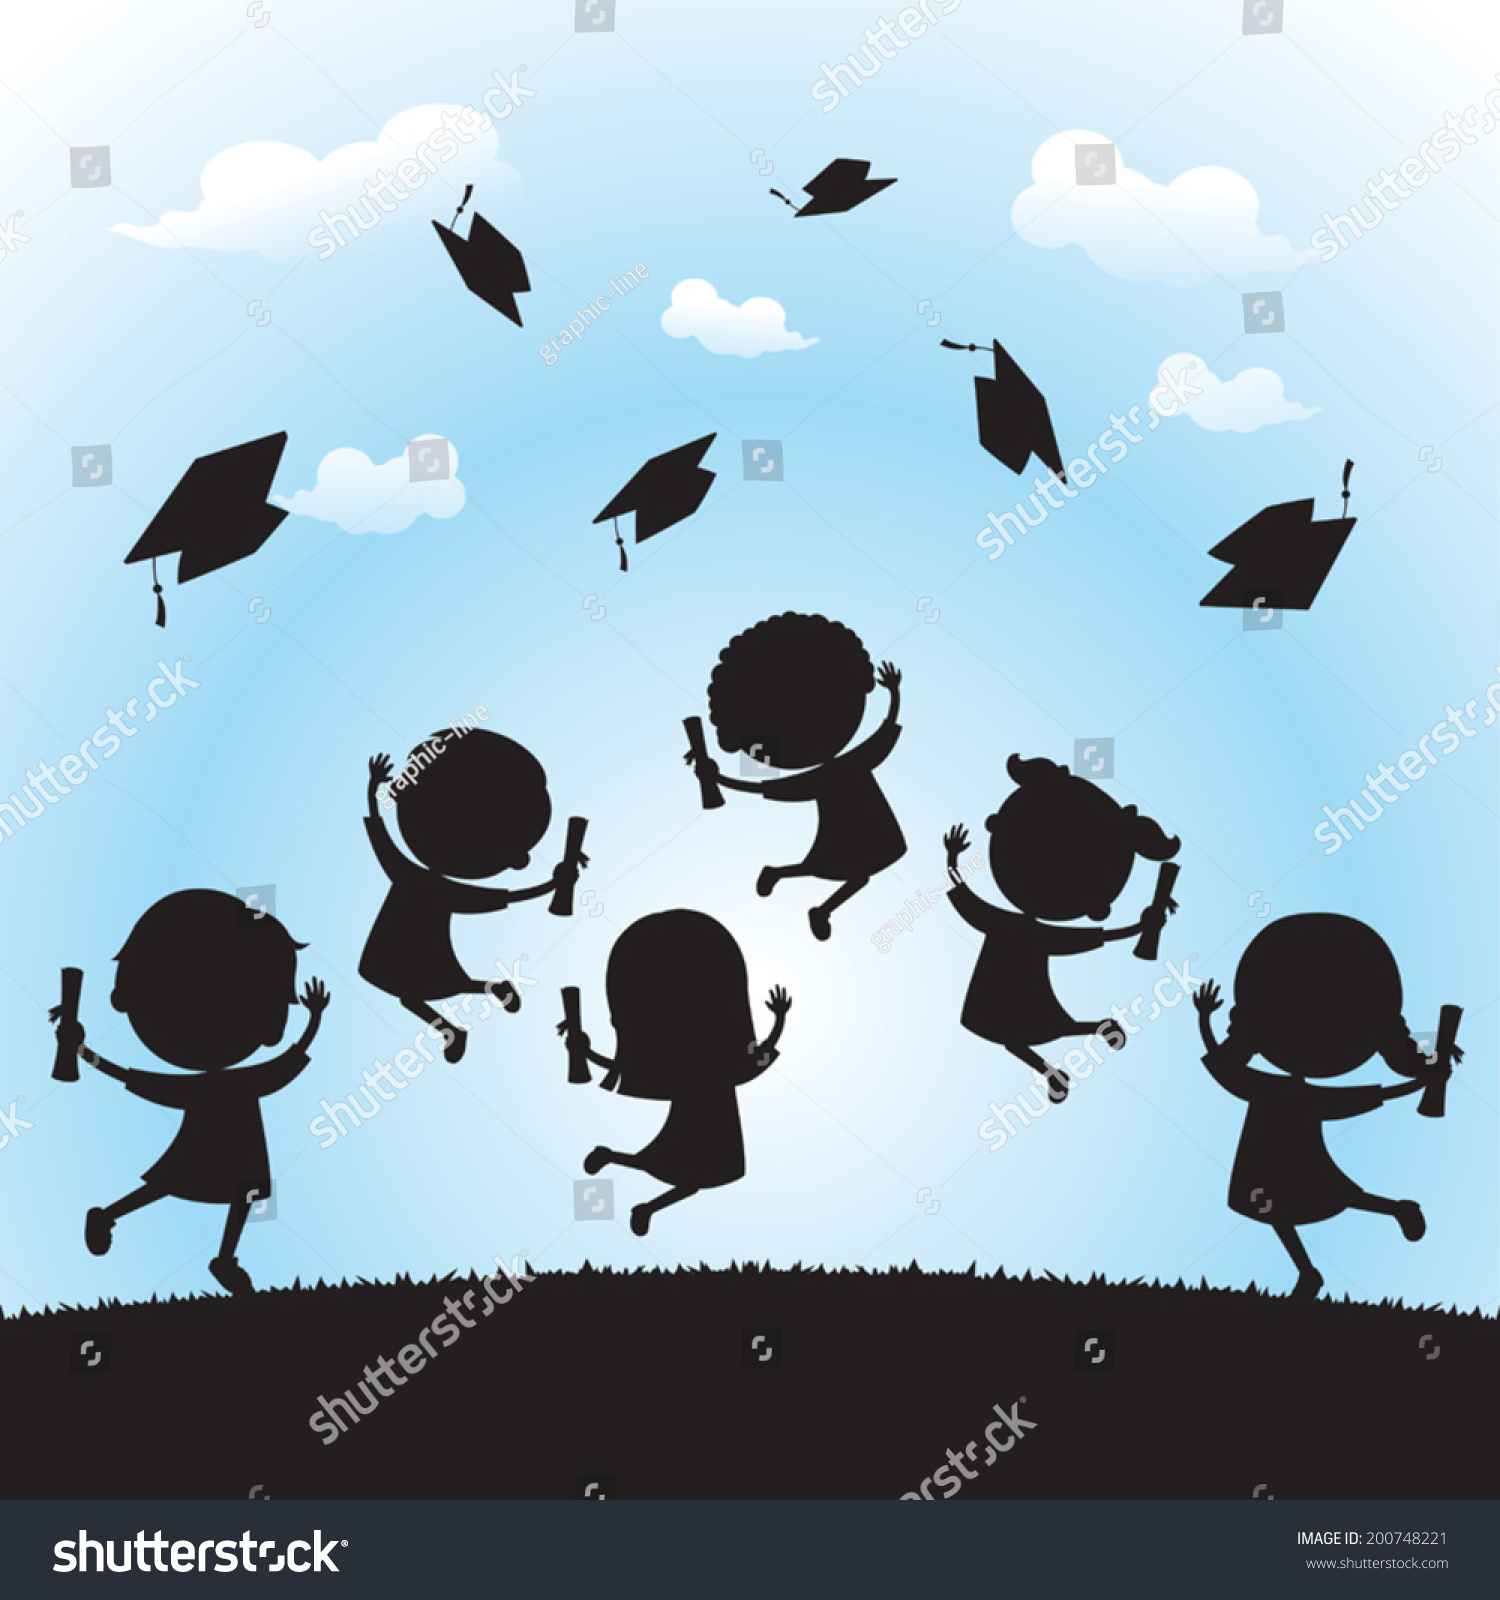 jumping graduate silhouette wwwpixsharkcom images